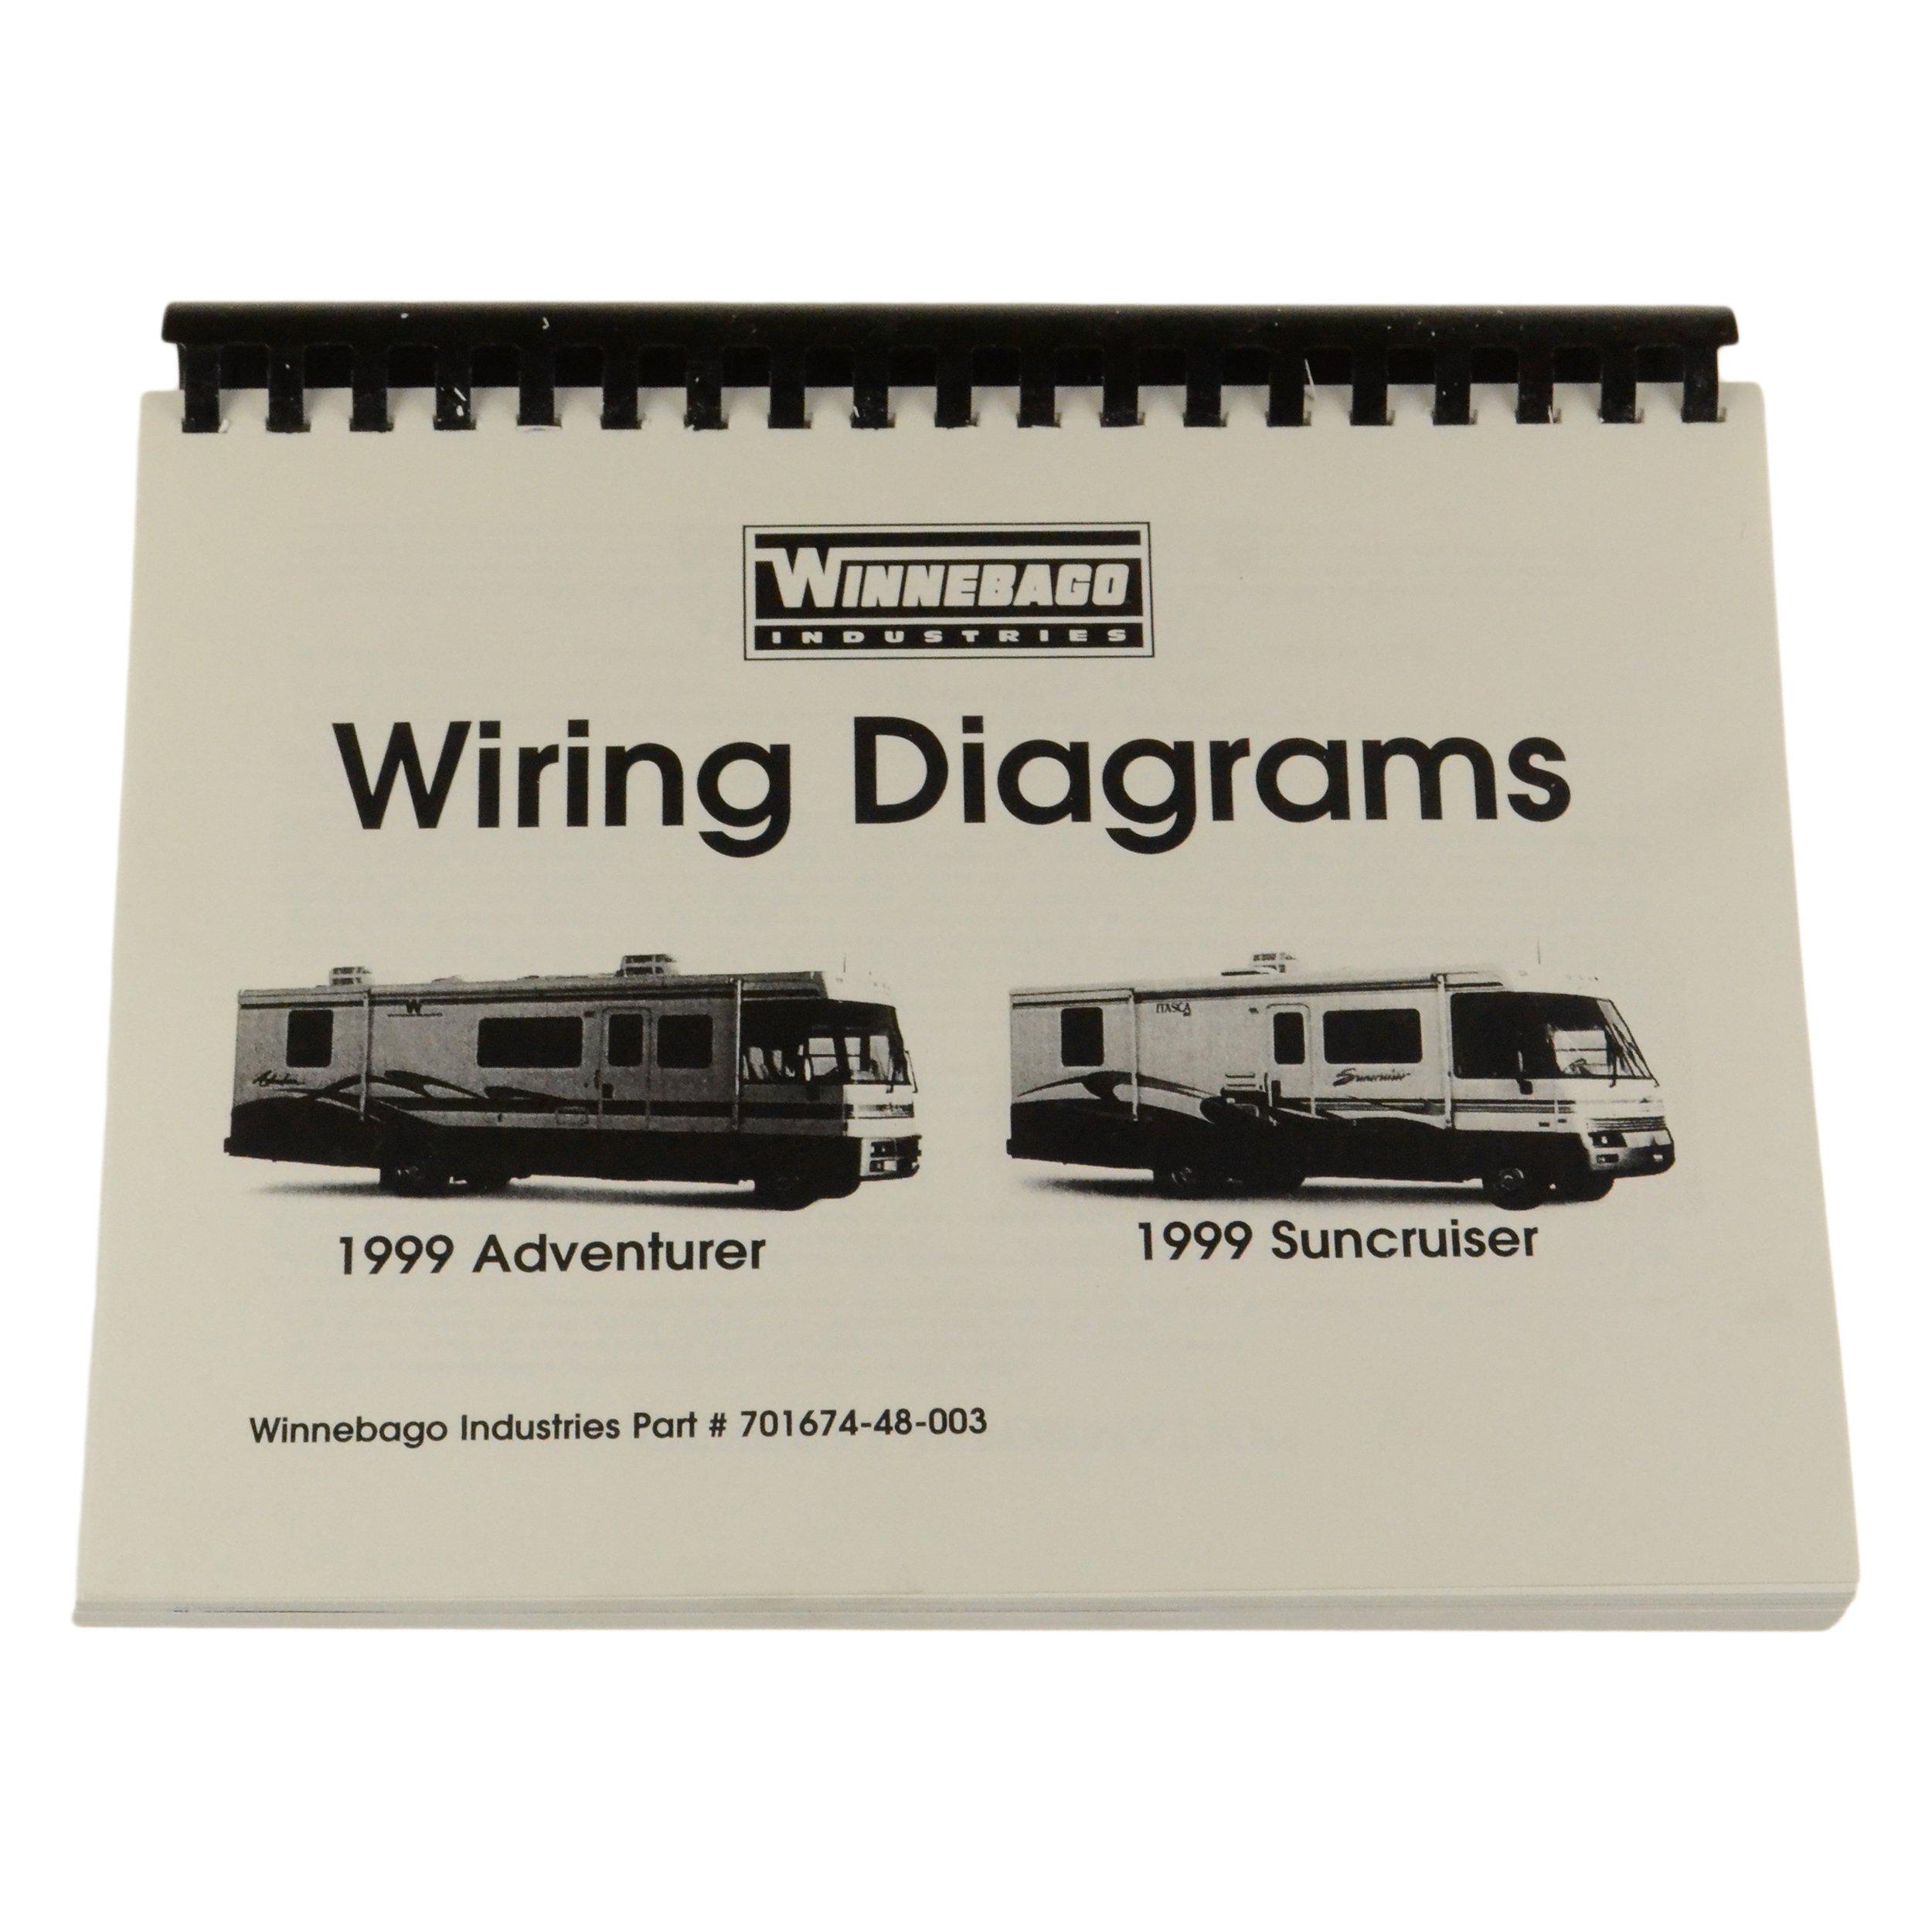 1999 G-Series Wiring Diagrams: Winnebago Industries: 0019372823667:  Amazon.com: BooksAmazon.com